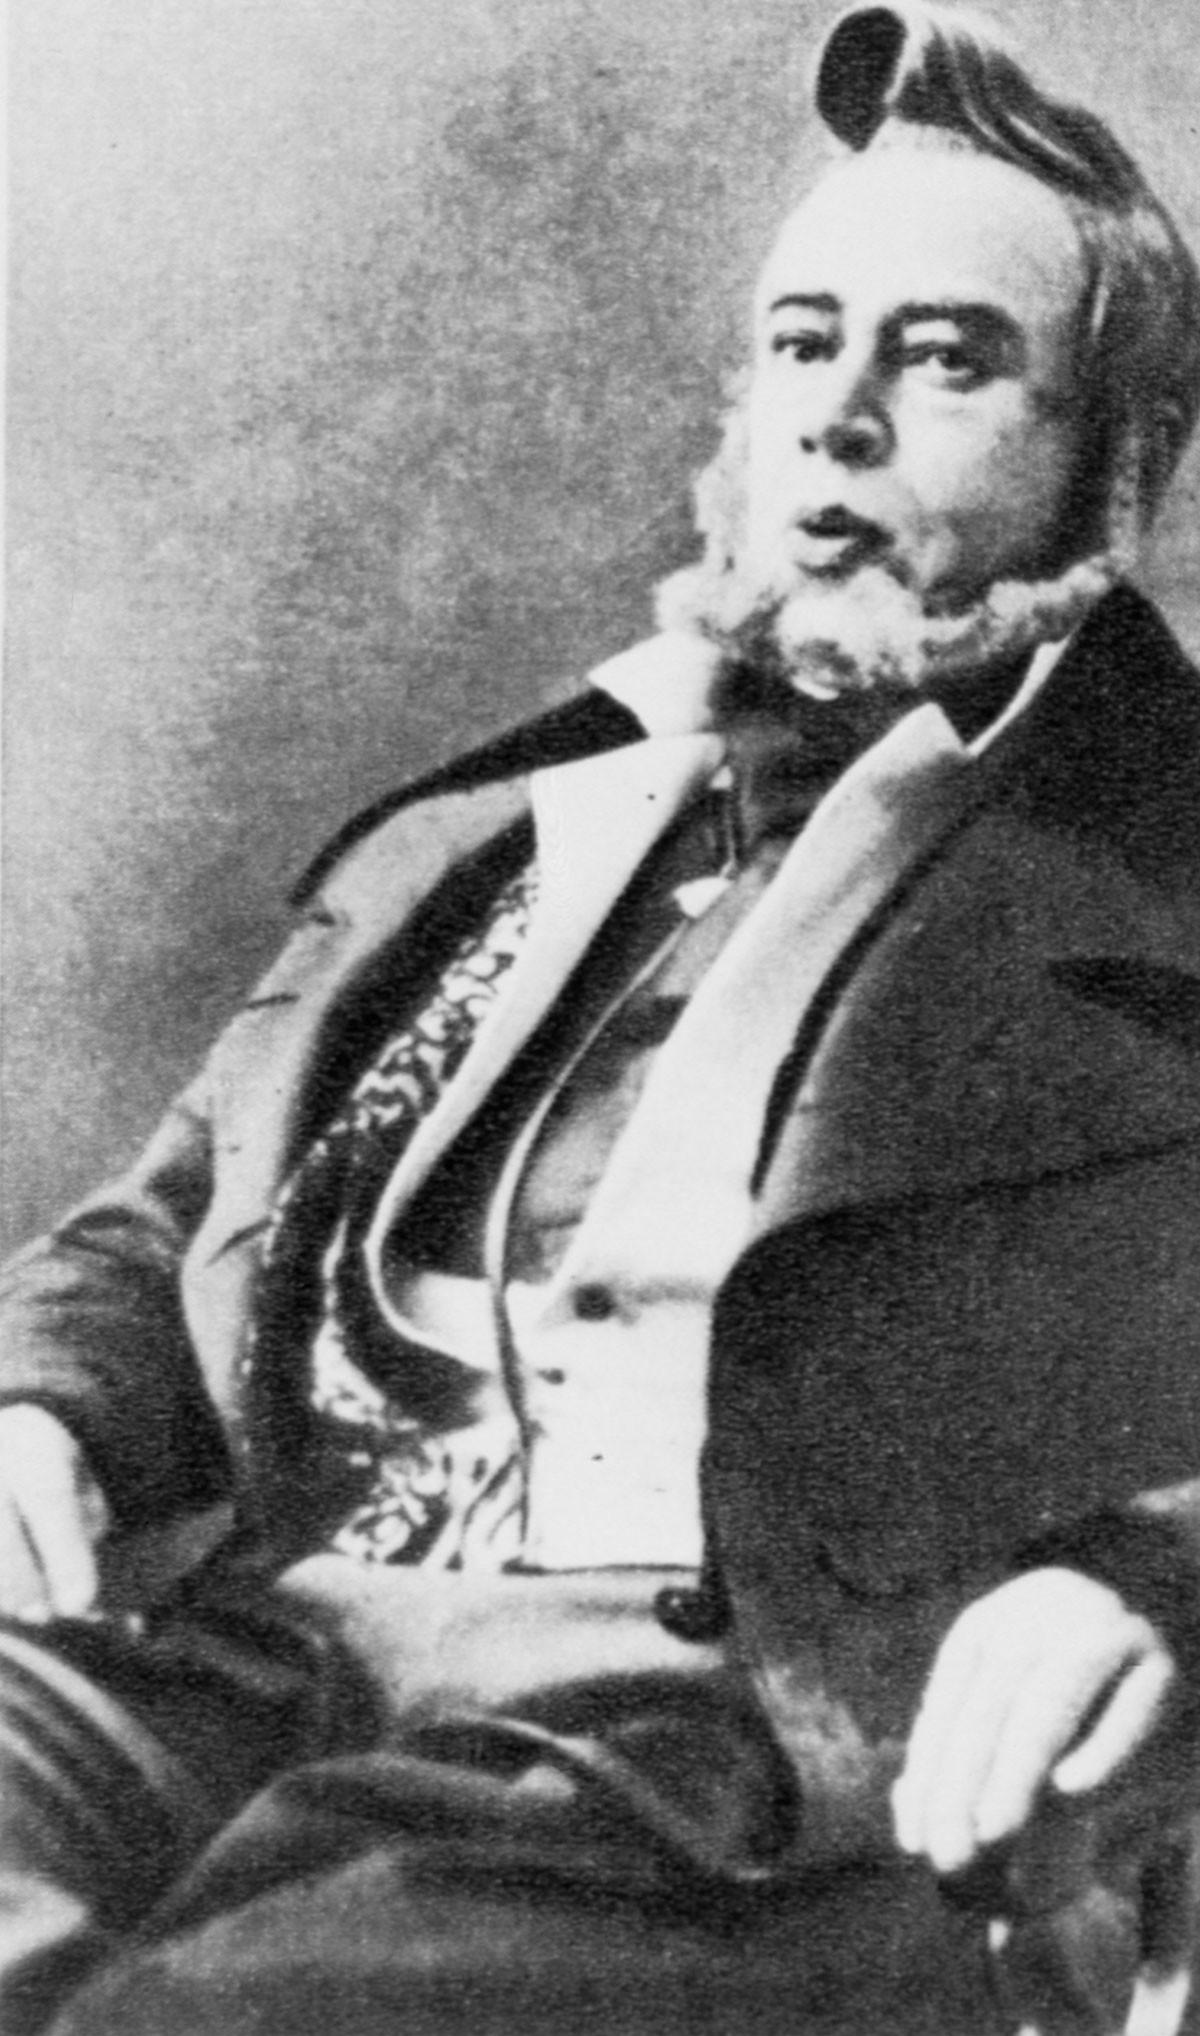 Konstantin Stanislavsky as Famusov in Alexander Griboedov's 'Woe from Wit'.